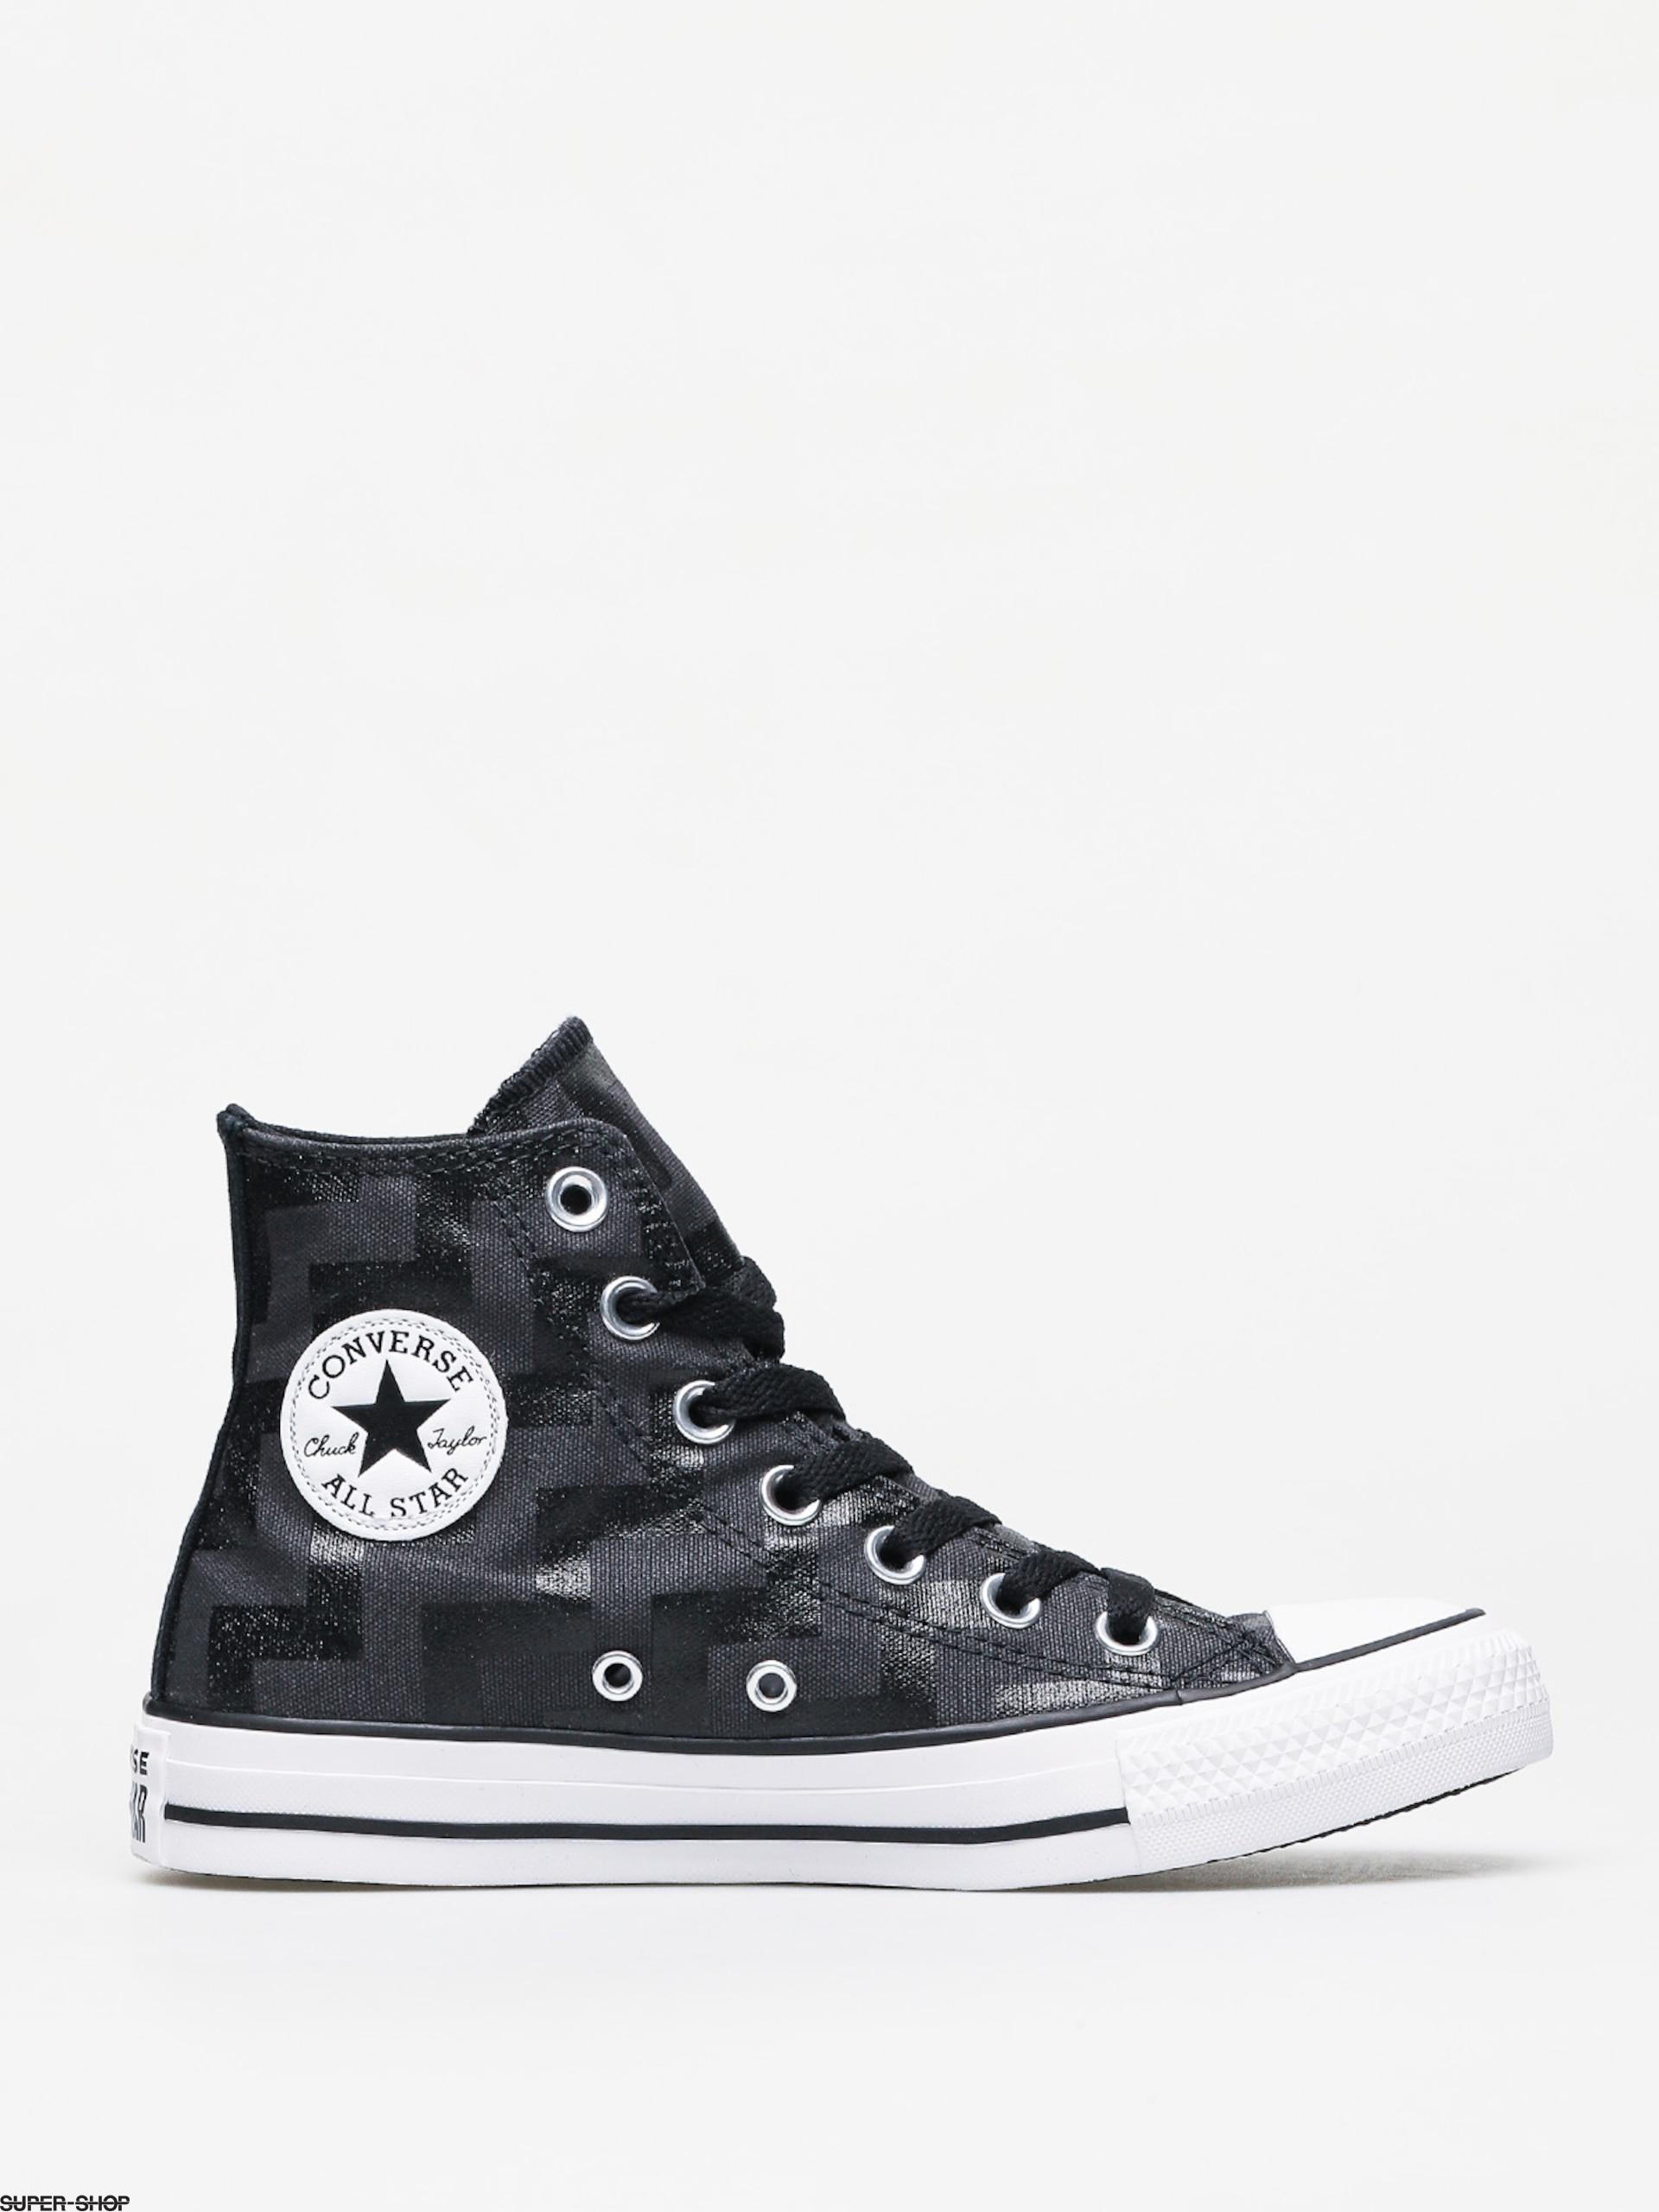 converse taylor all star hi